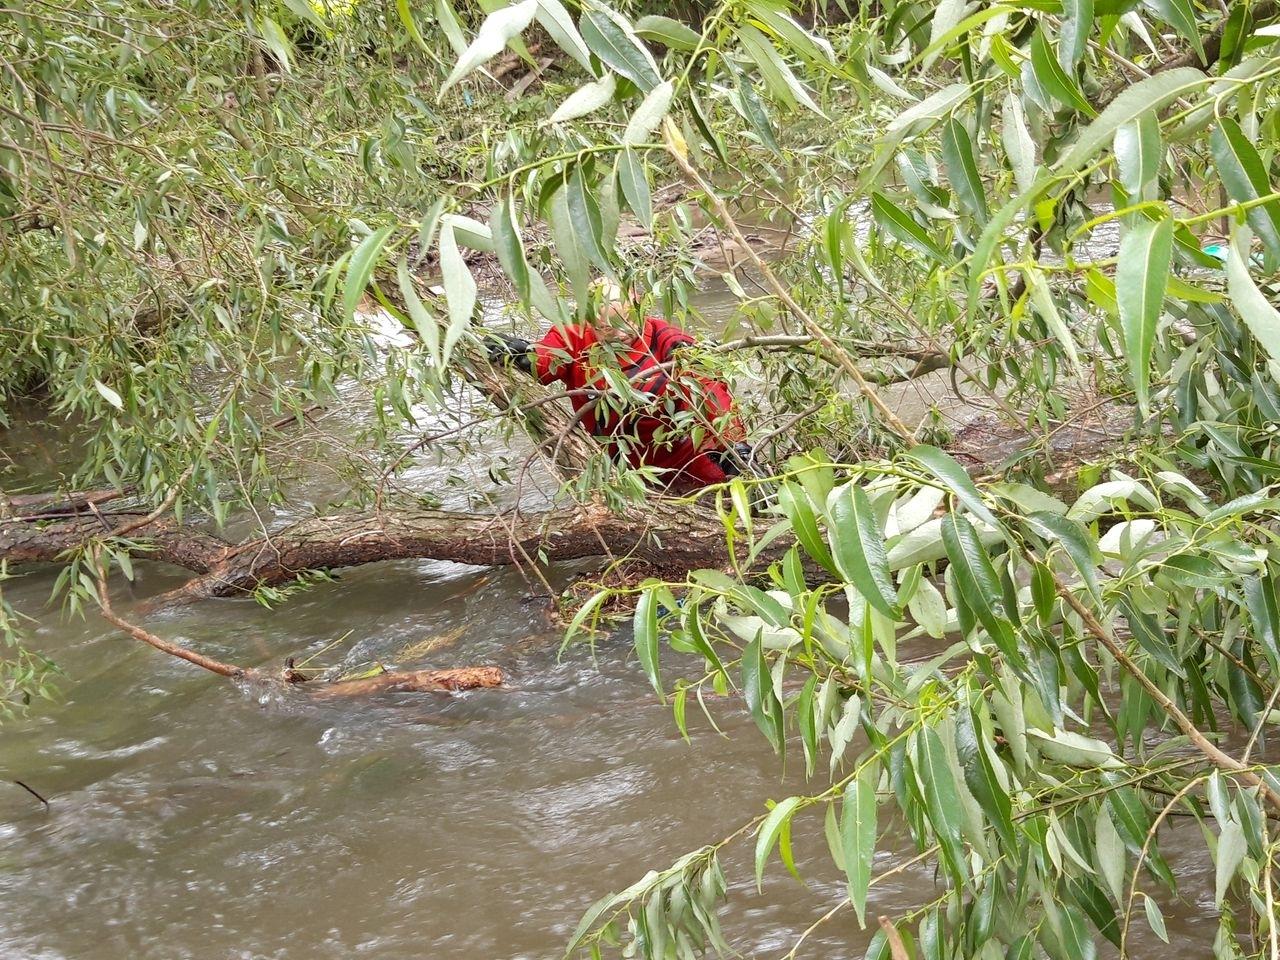 enu, kter zmizela pi povodnch v Oskav, hledaj i potpi